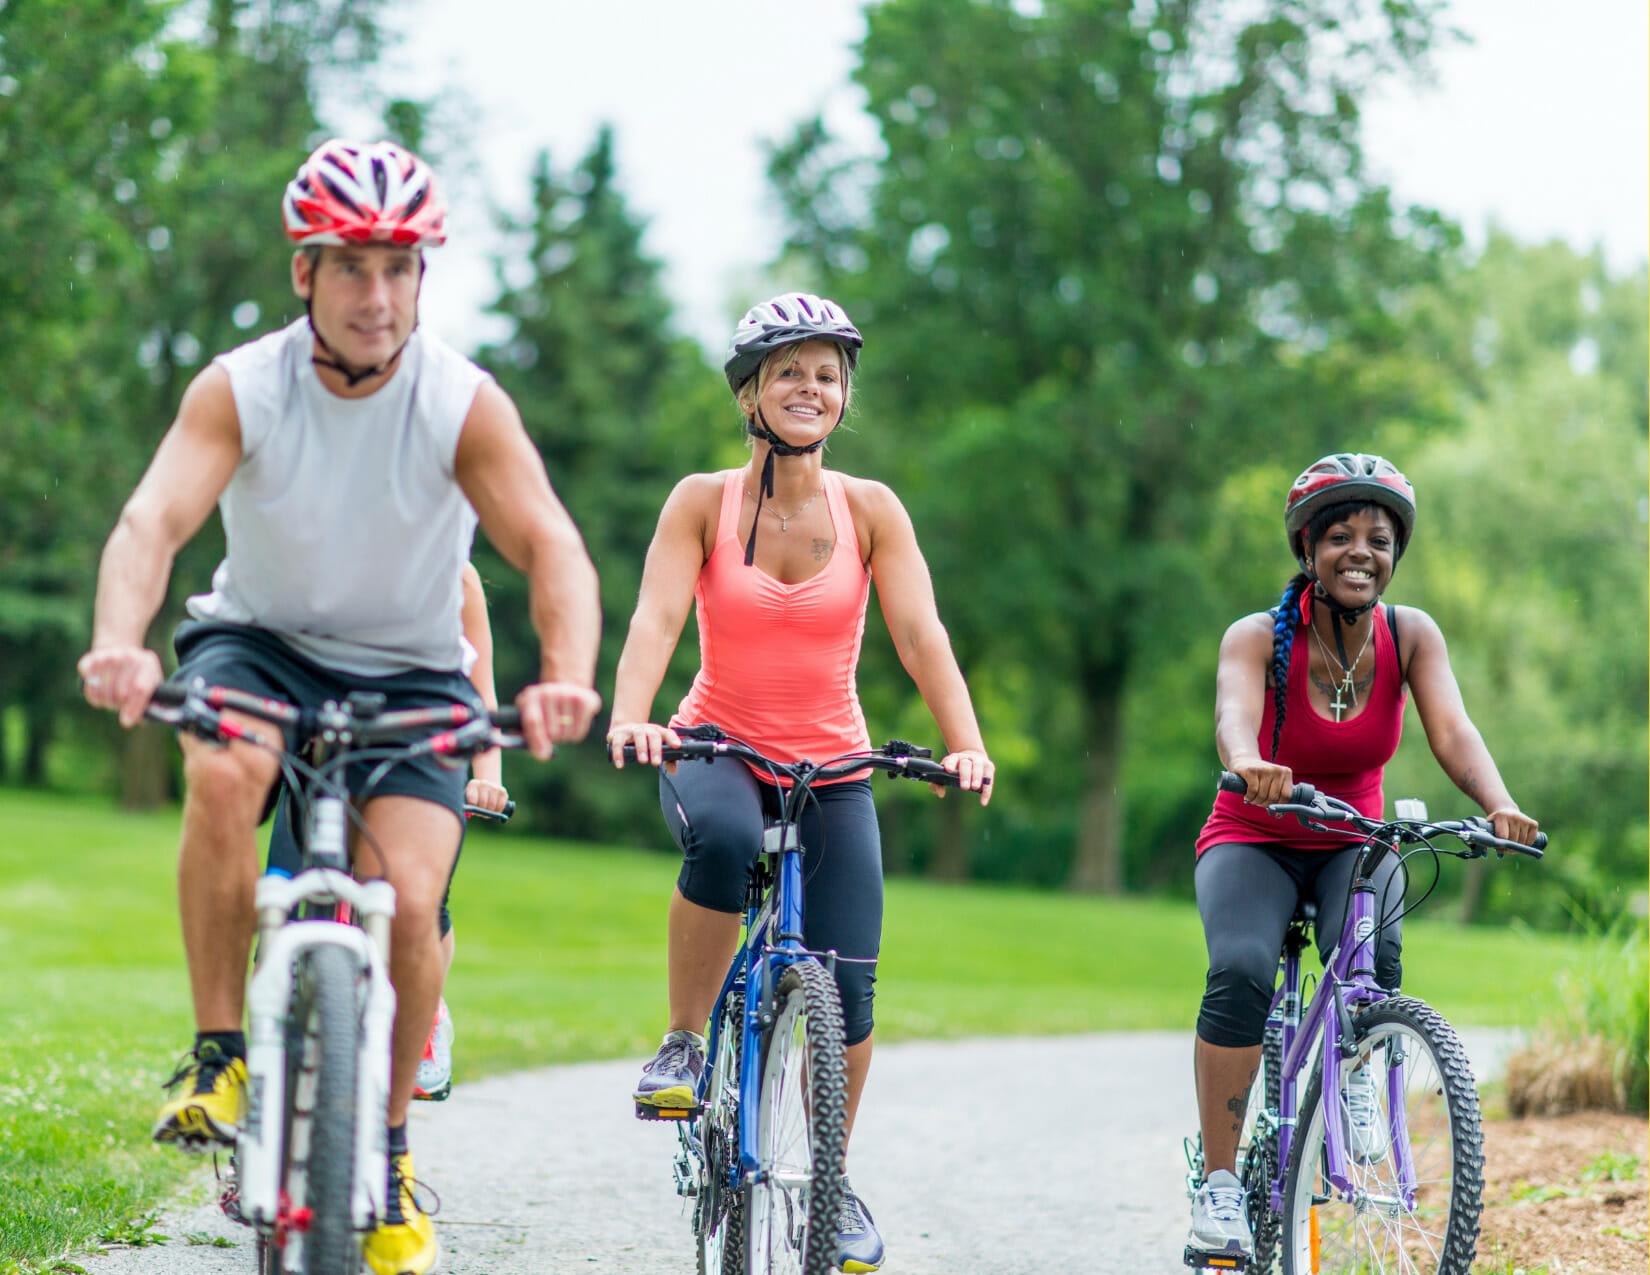 Bike Riding Together